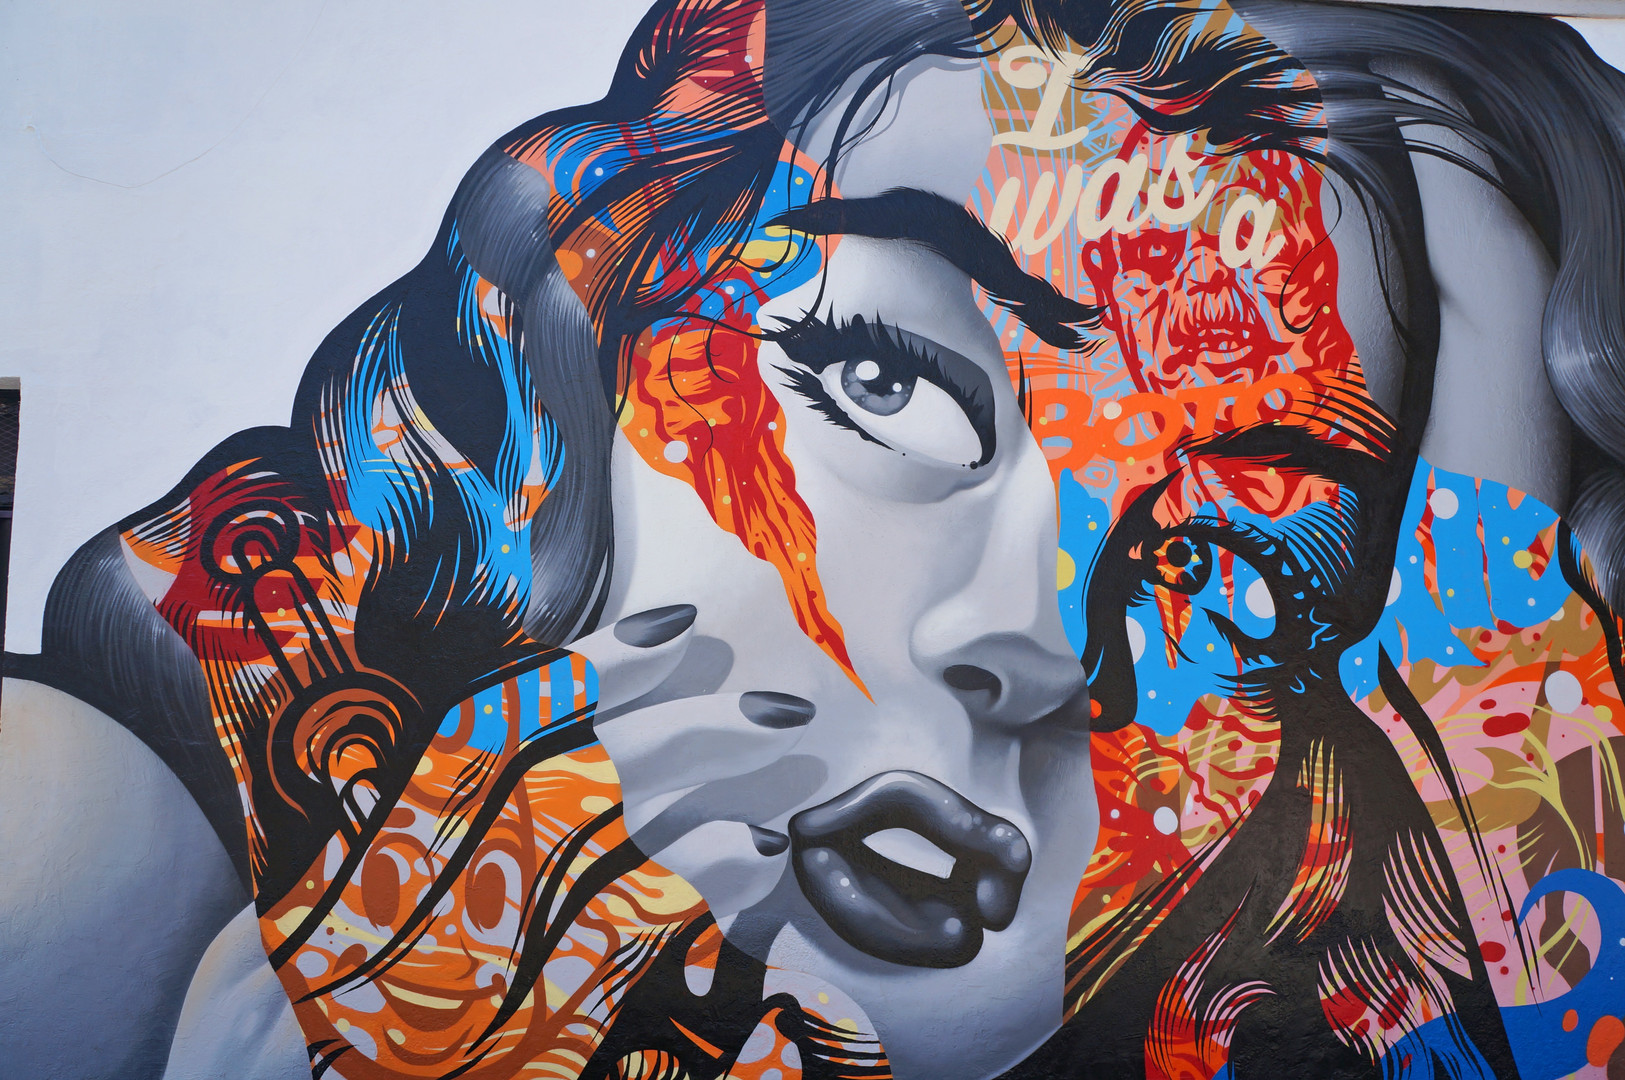 Галереи в Лос-Анджелесе.jpg